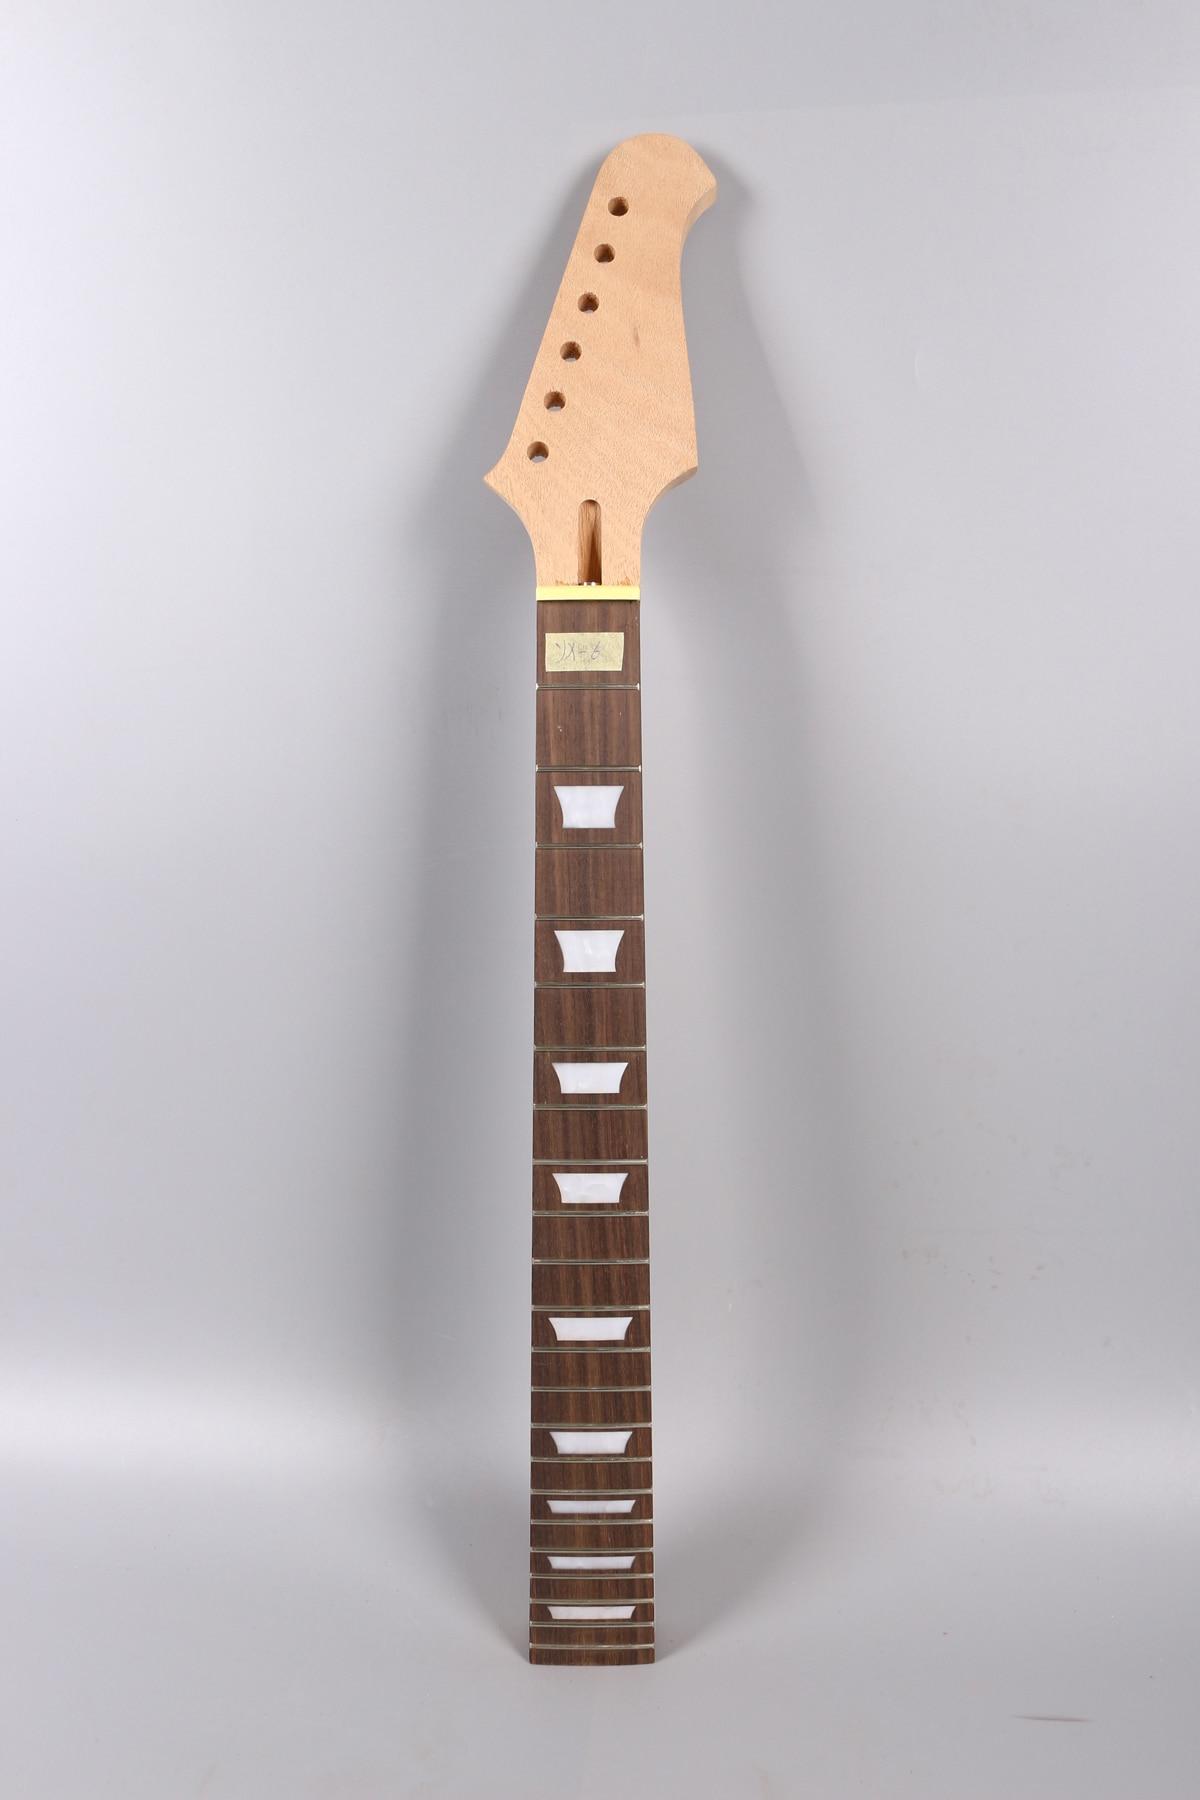 Custom Order 22fret Guitar Neck 24.75 Inch Mahogany Rosewood Fretboard Set In Glue On Style Firebird Headstock